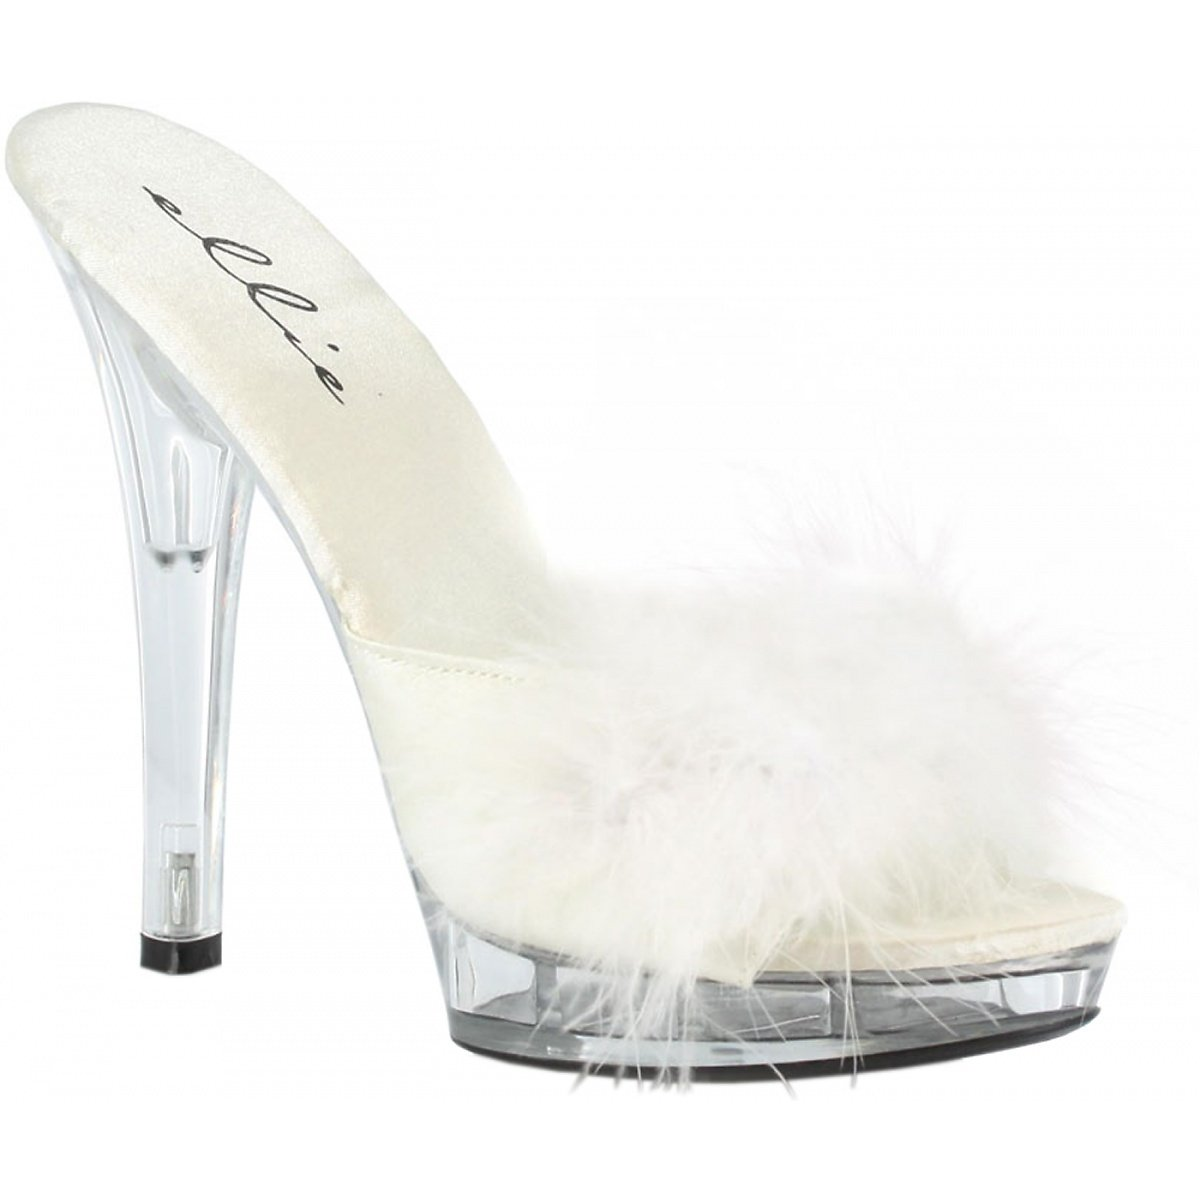 Sasha Shoes - Size 8